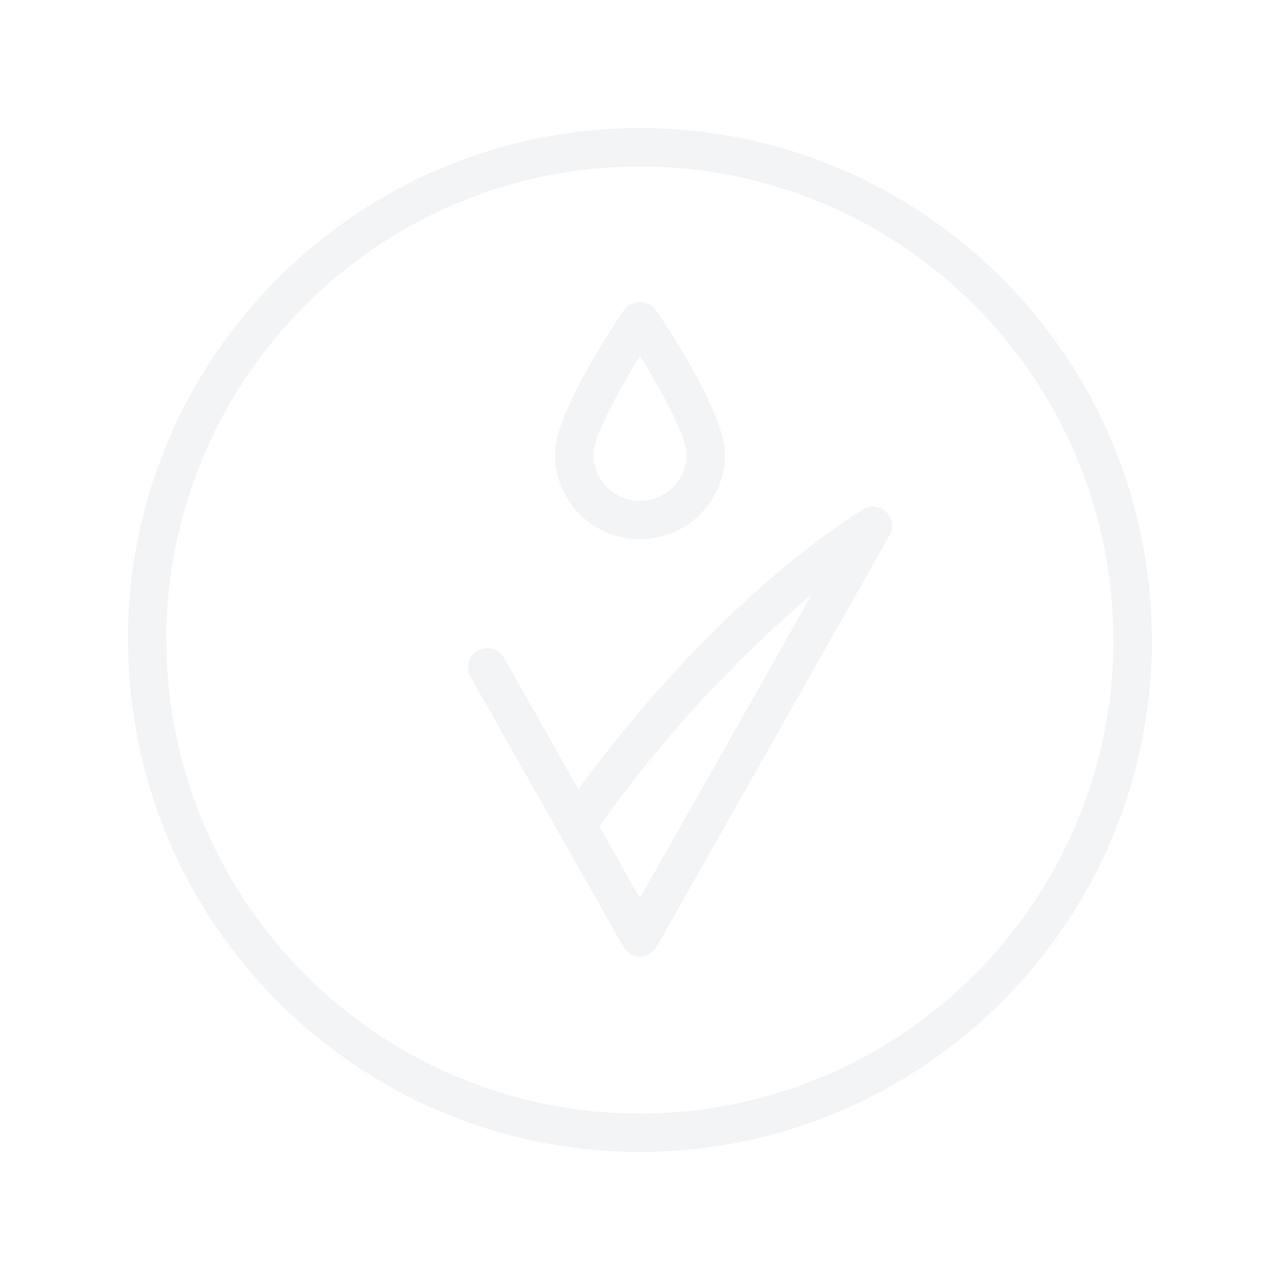 ANNA LOTAN Greens Camellia Tinted Day Cream SPF30 50ml